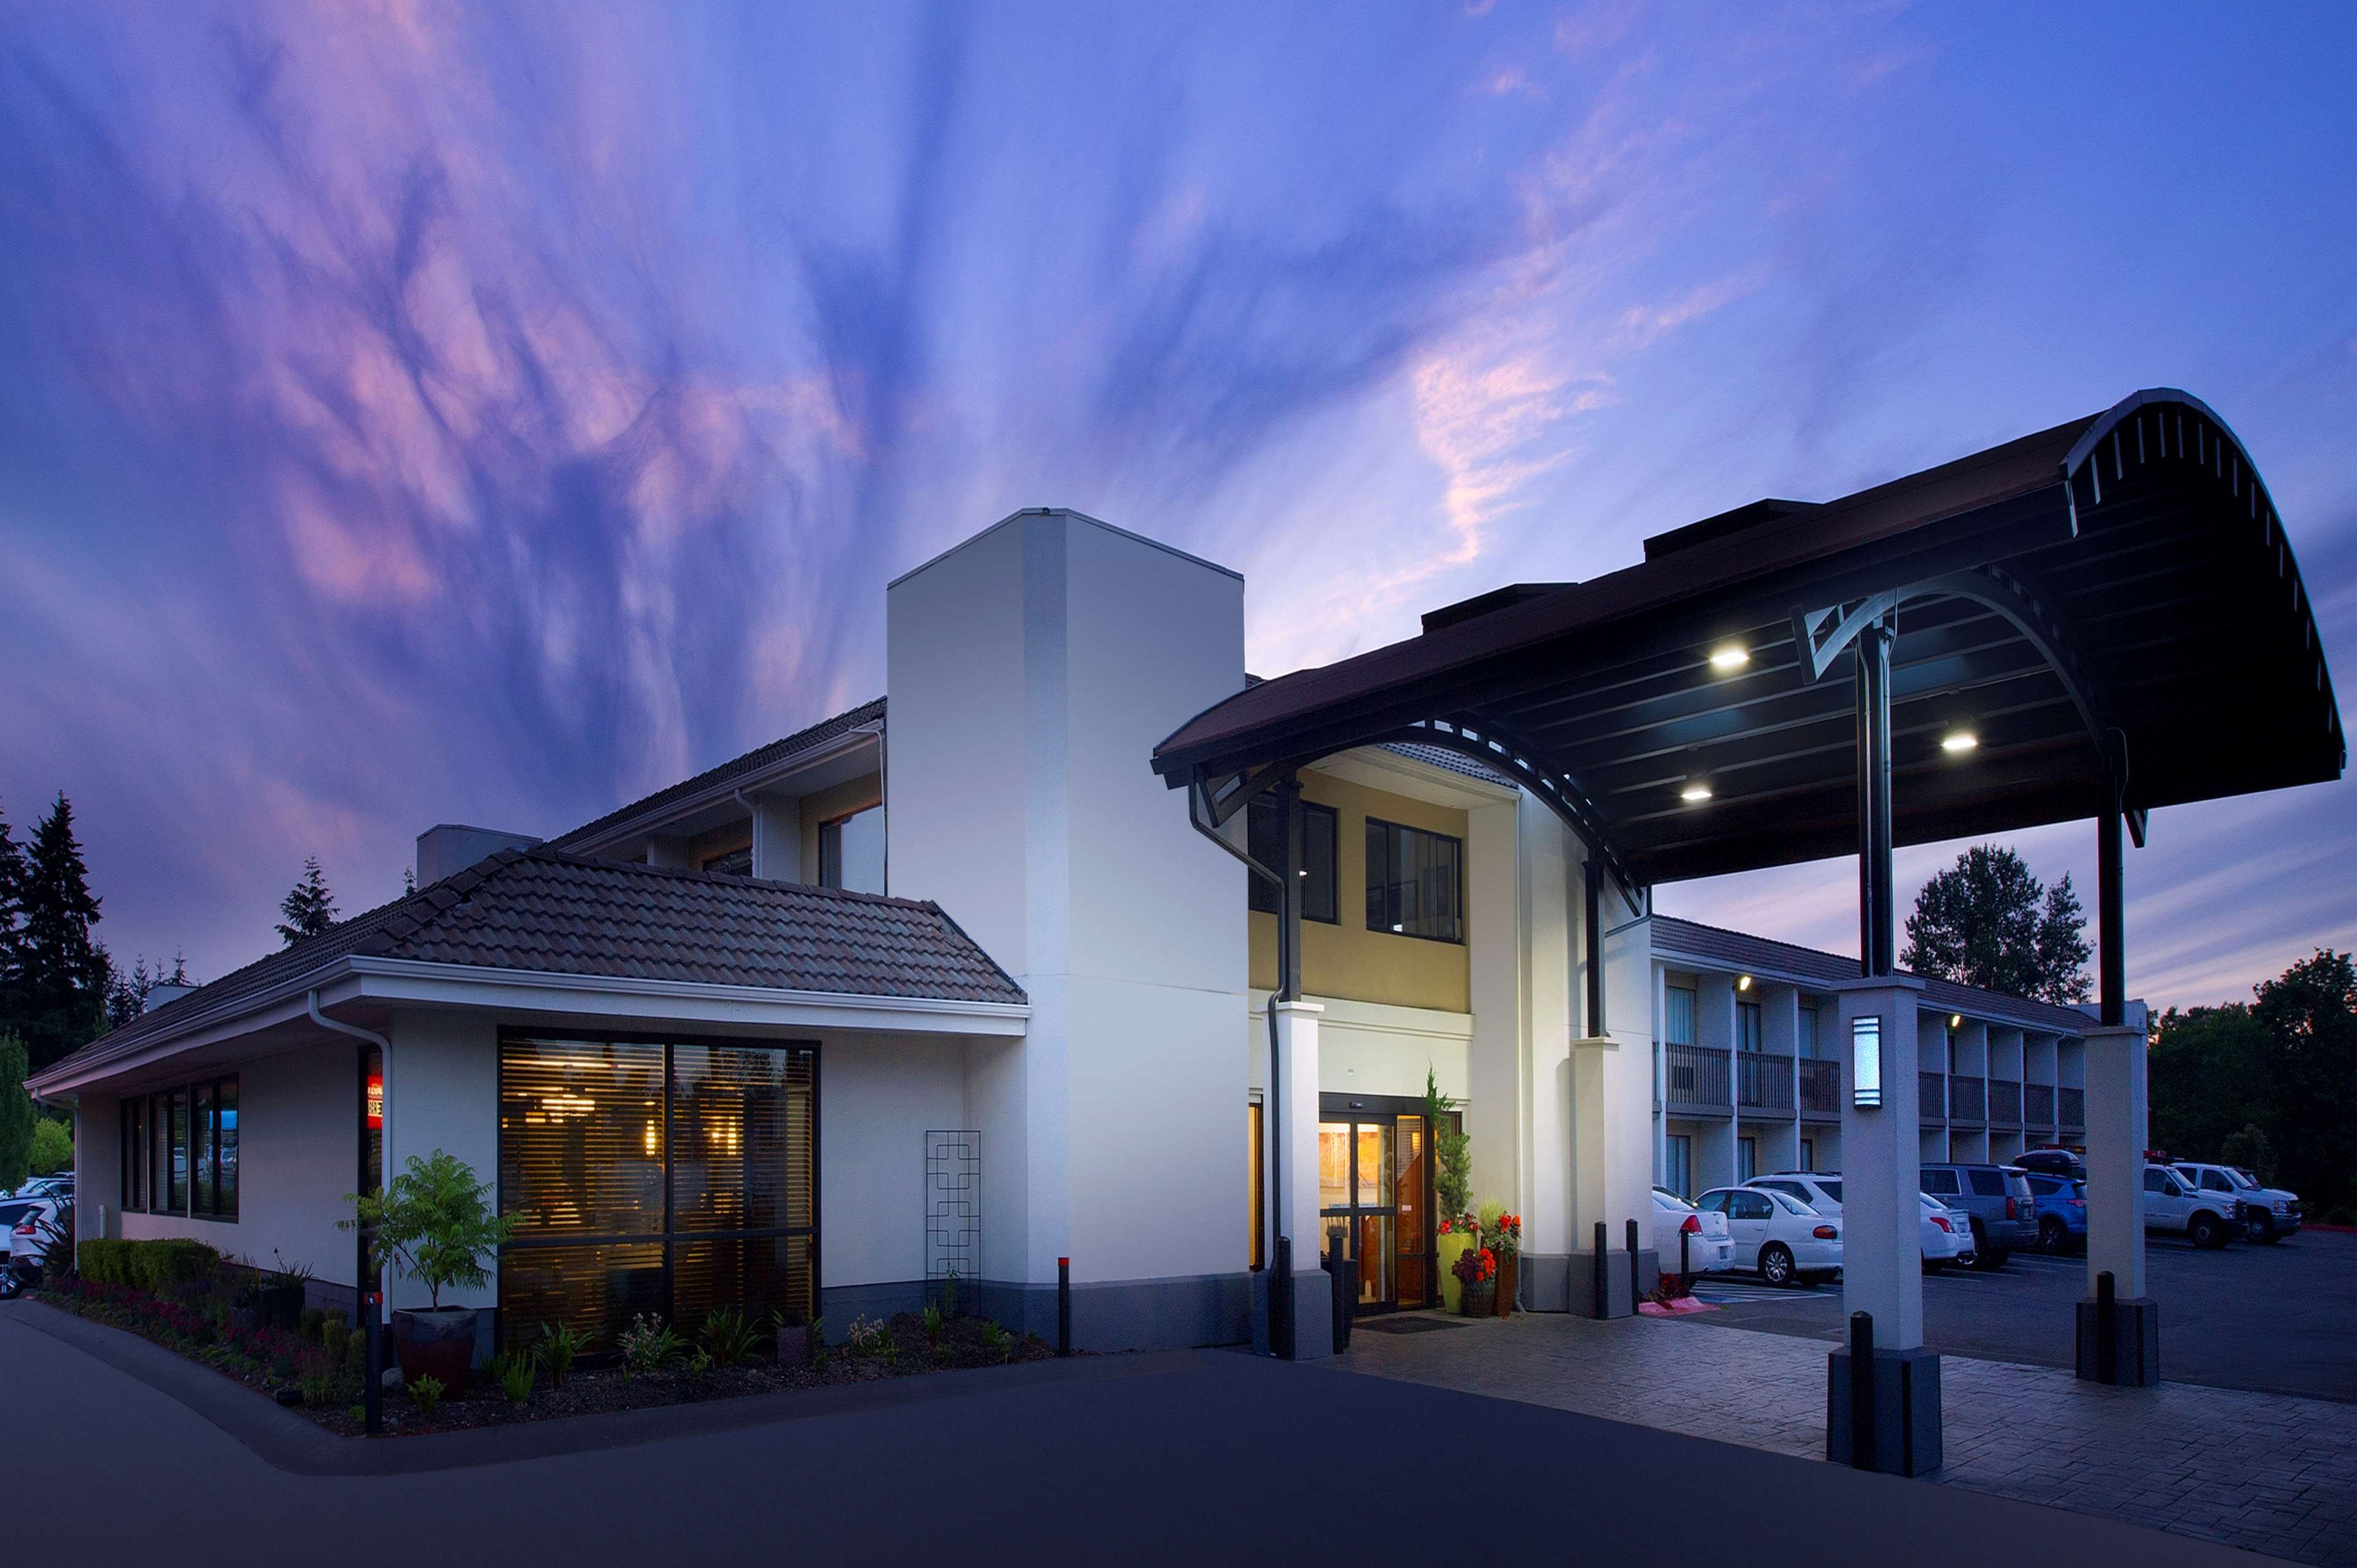 Best Western® Seattle Airport Hotel Best Western Seattle Airport Hotel Seattle (206)878-3300